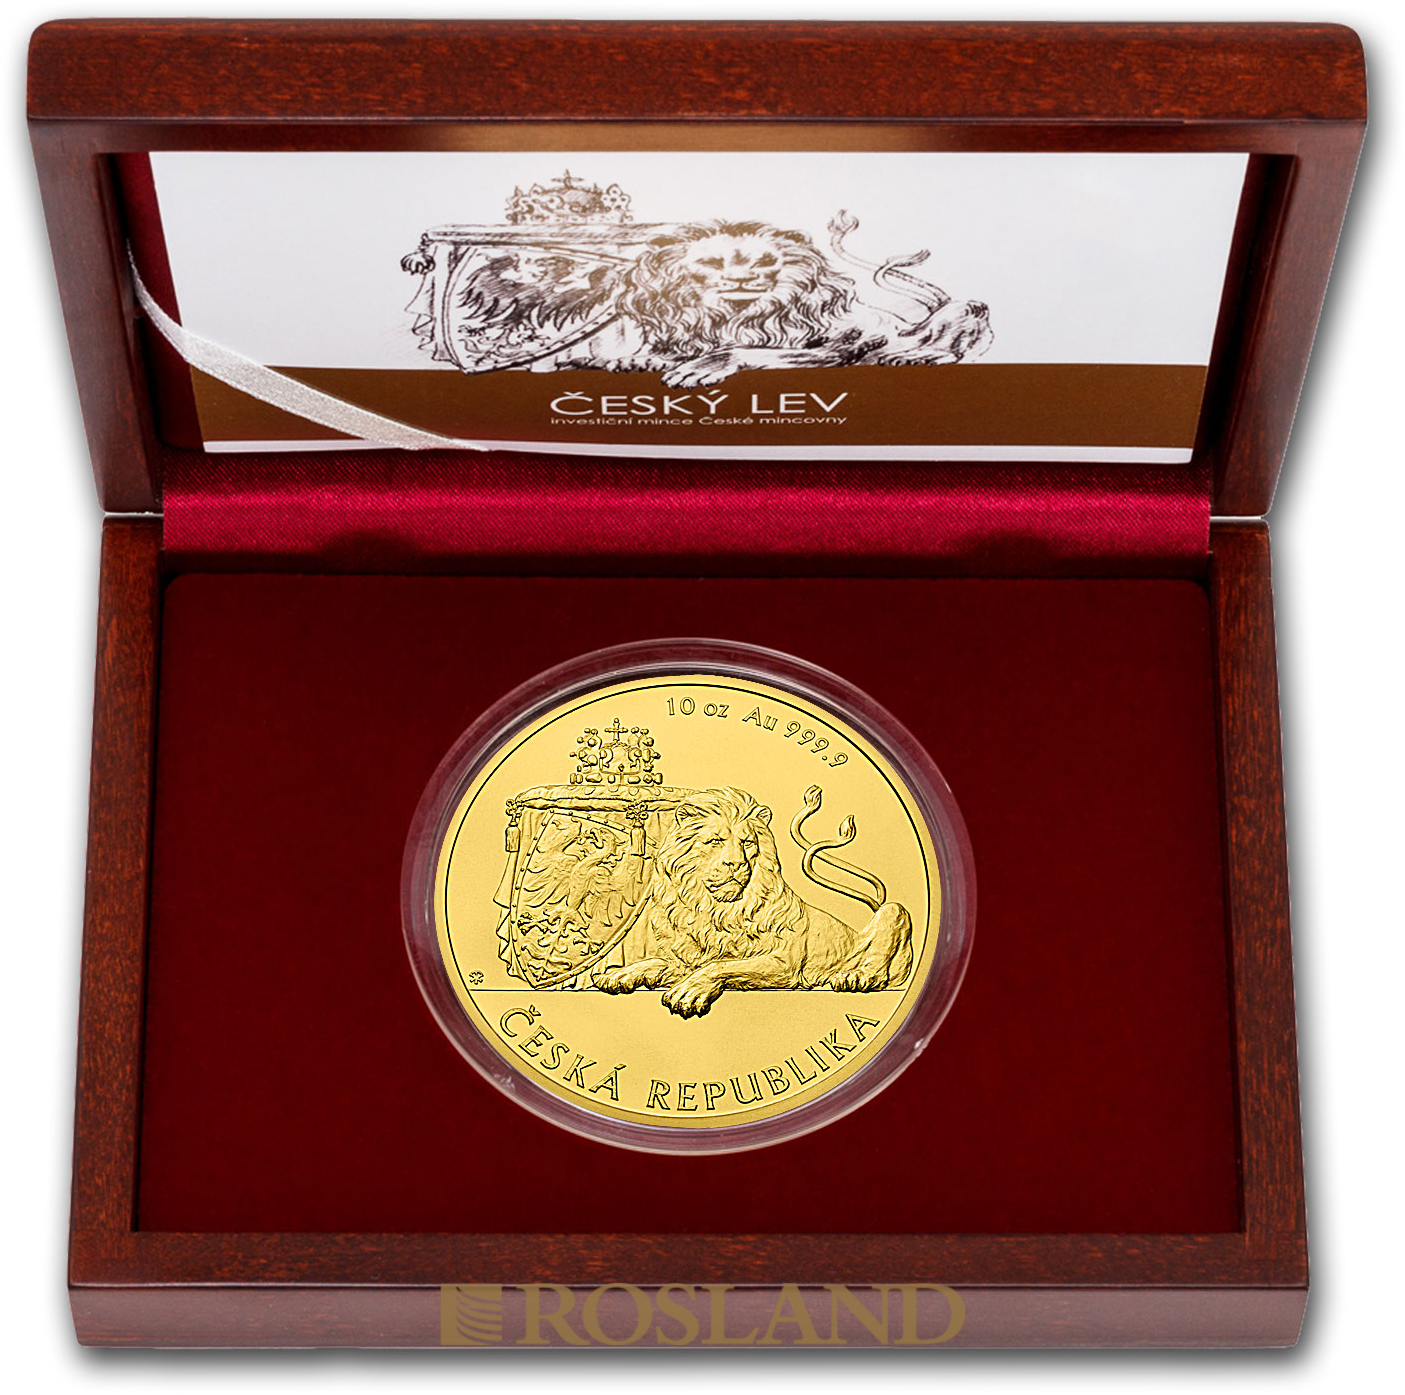 10 Unzen Goldmünze Tschechischer Löwe 2018 (Box, Zertifikat)